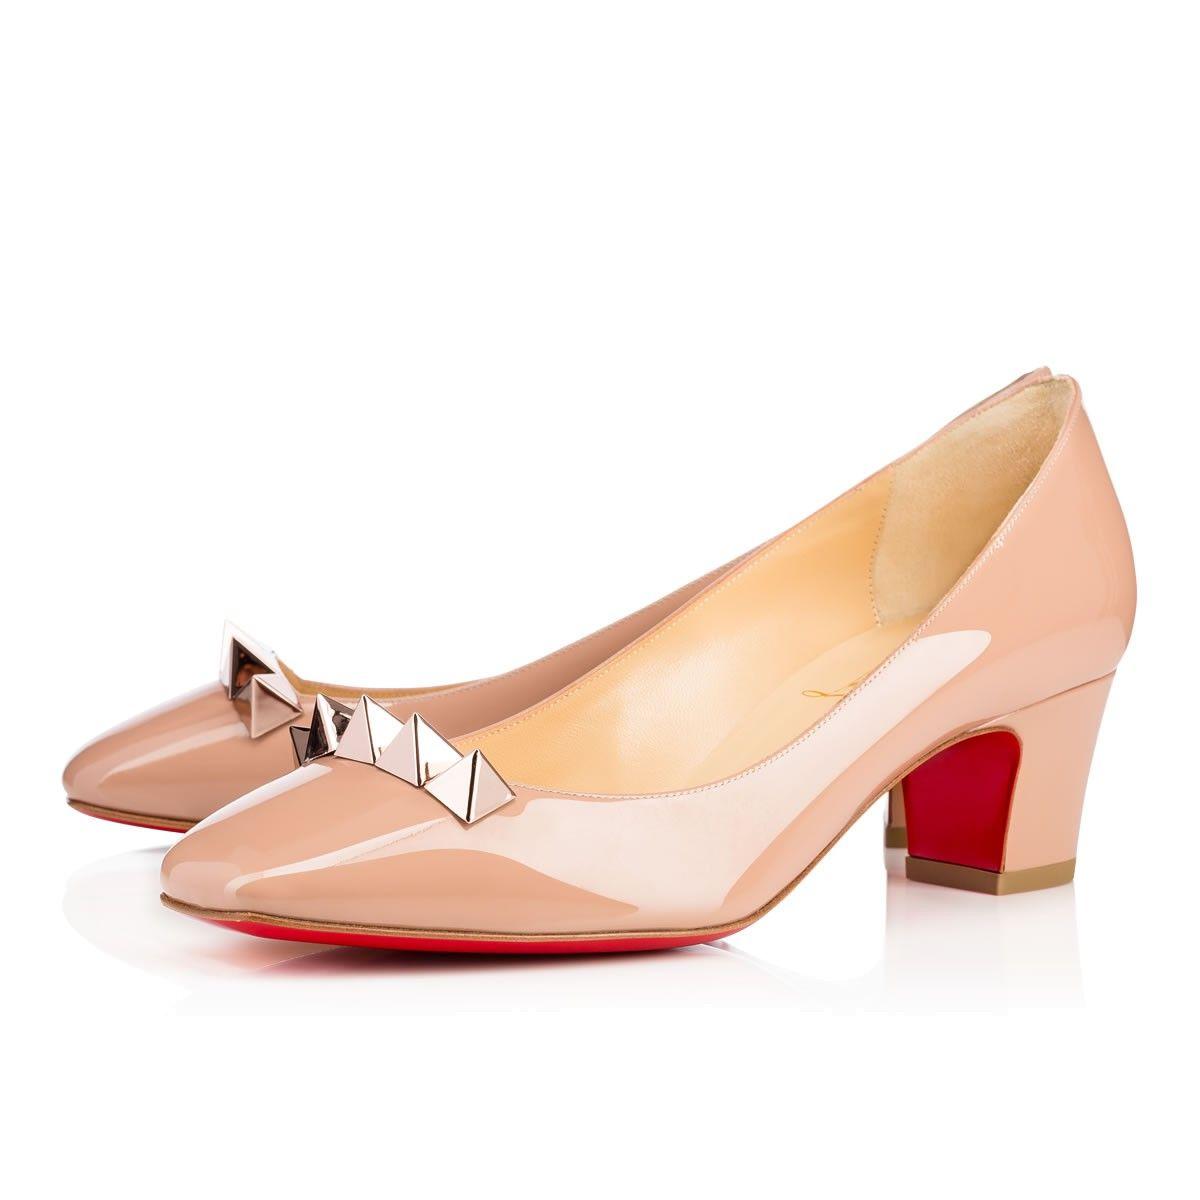 half off e758e 94536 Shoes - Pyramidame - Christian Louboutin | Styling tips ...